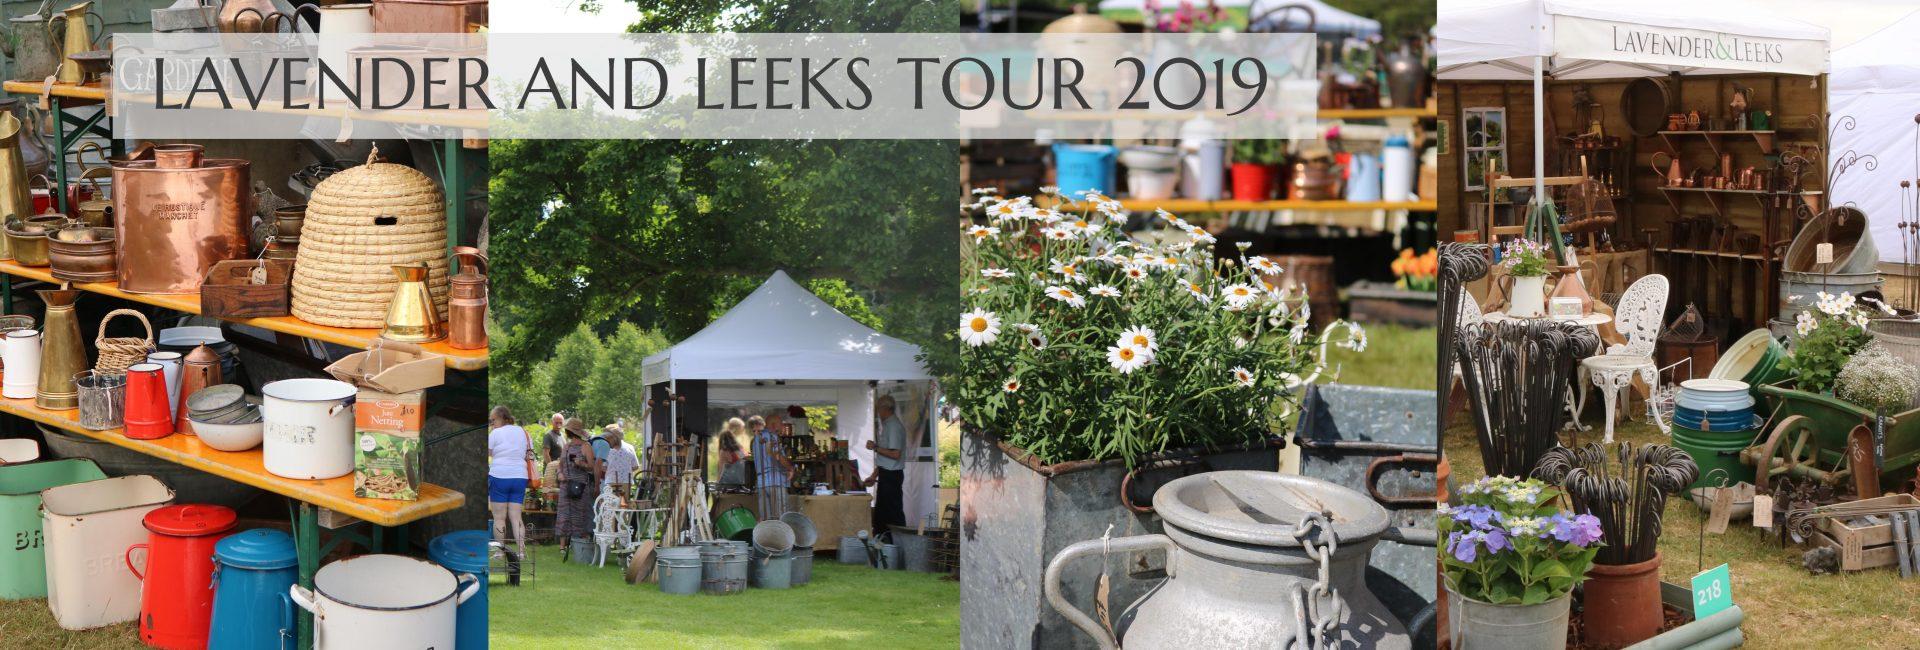 Lavender and Leeks Tour 2019